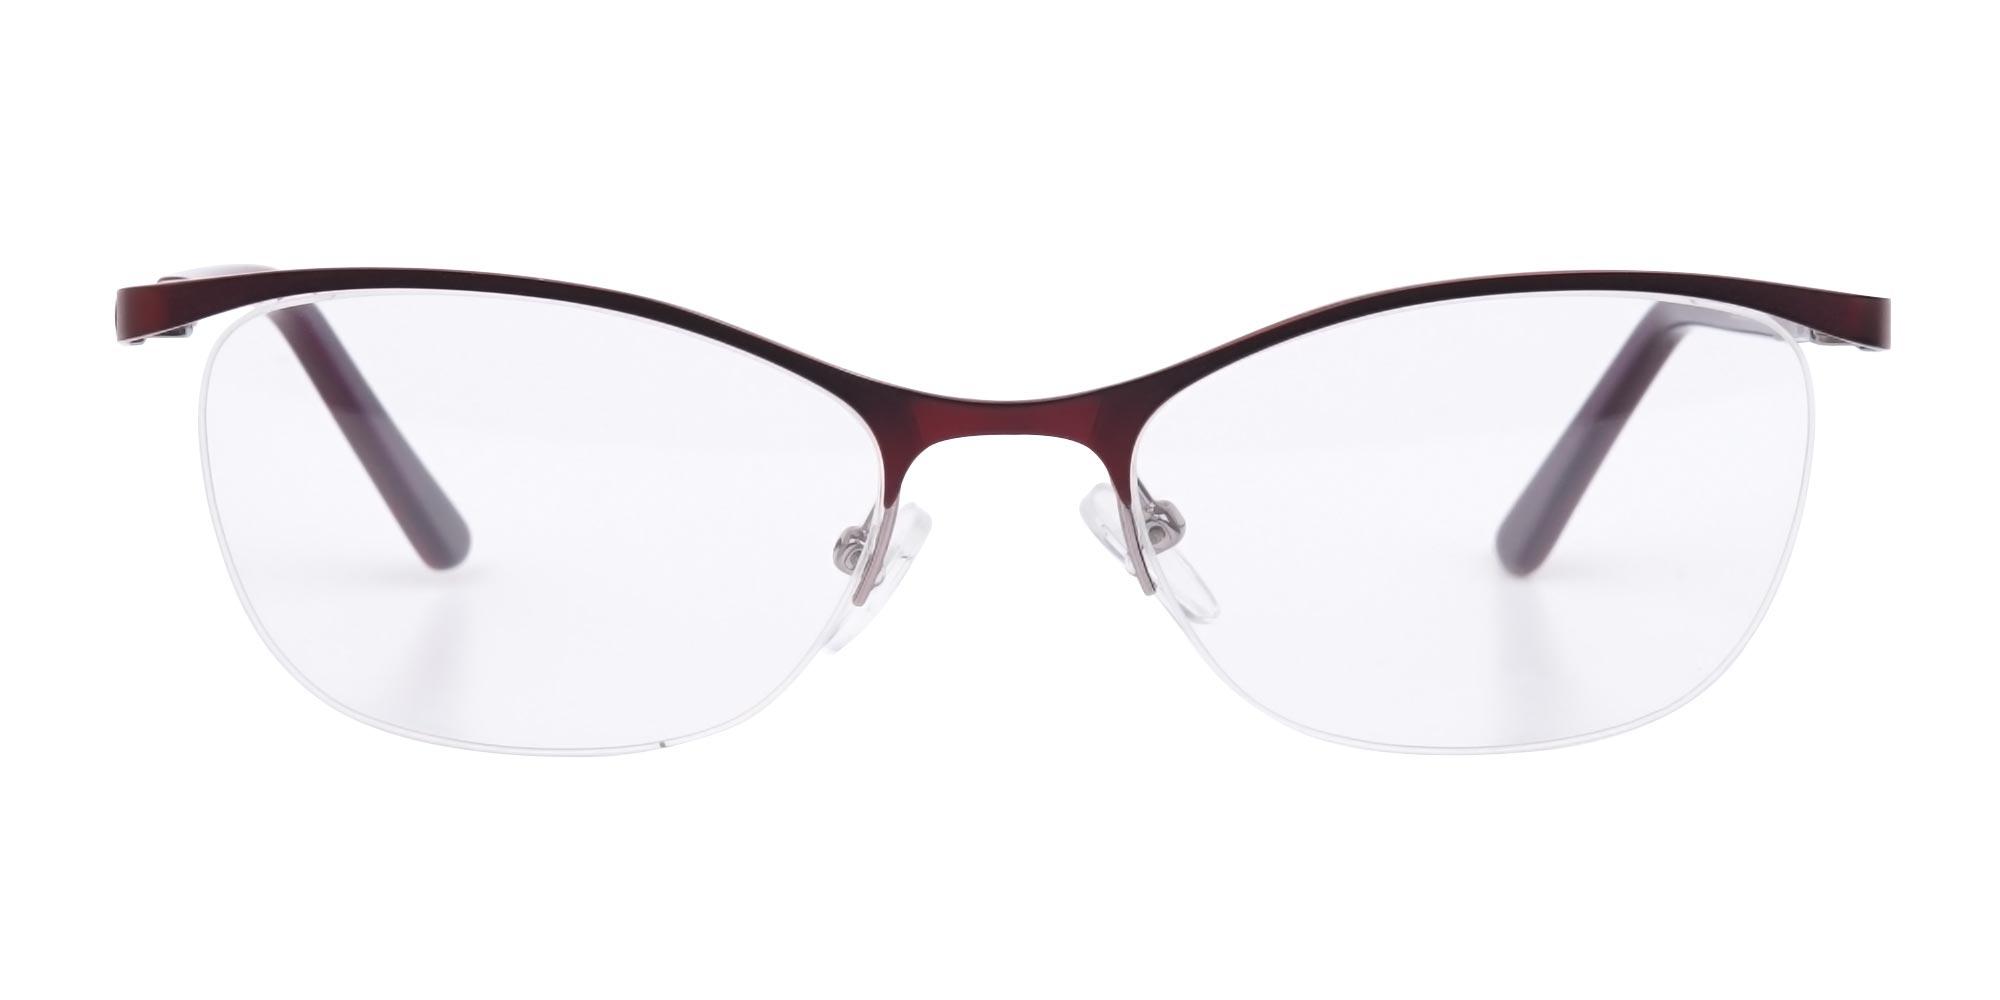 Oval Cat Eye glasses